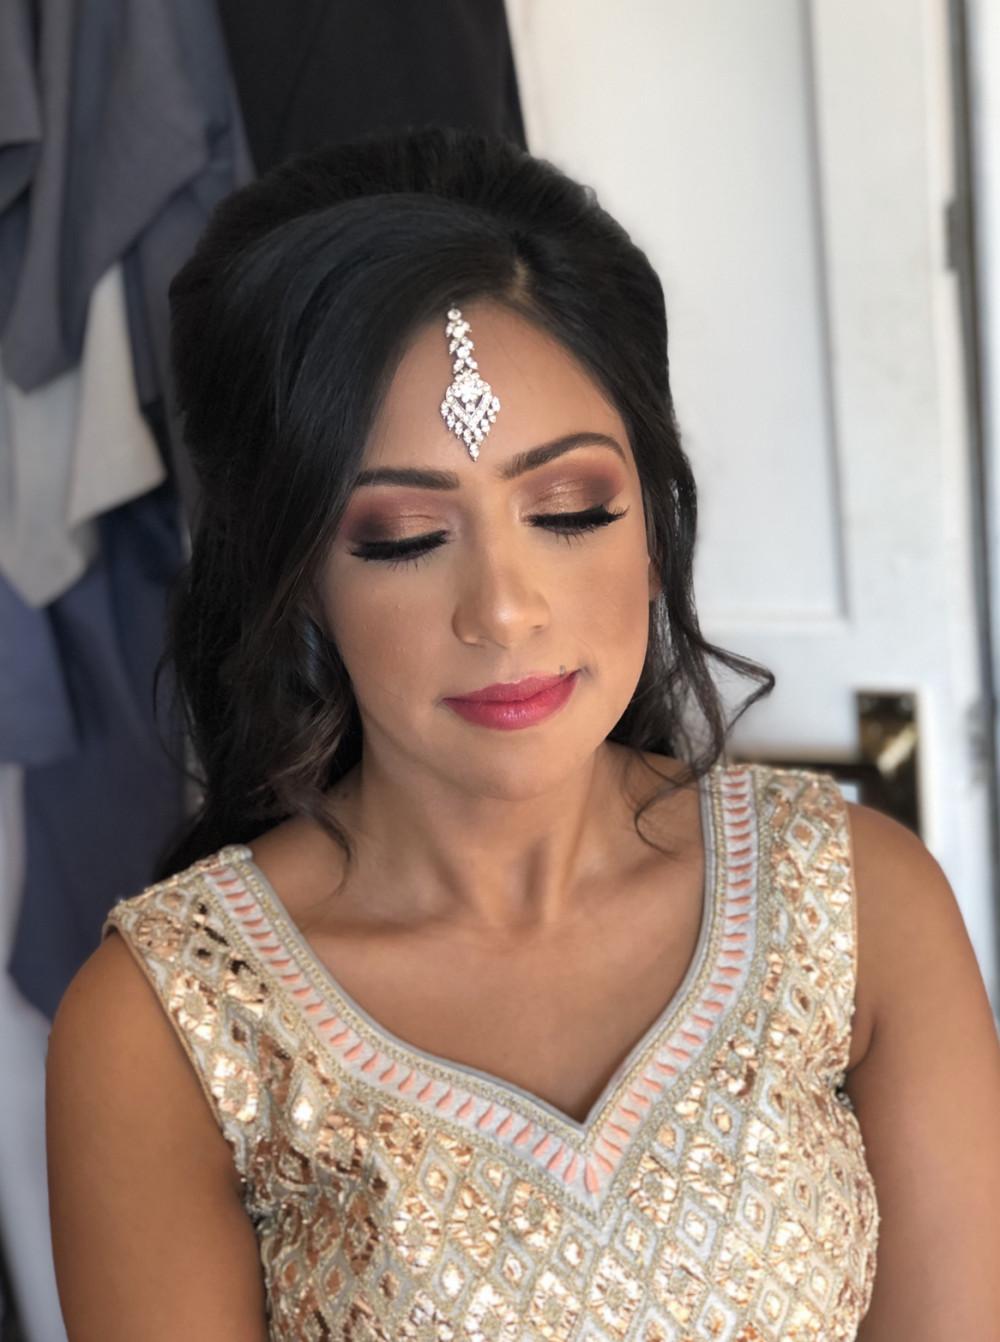 Asian Wedding Hair & Makeup in Woking Surrey - Make Me Bridal Artist: Suzanne Dusek Hair & Makeup.